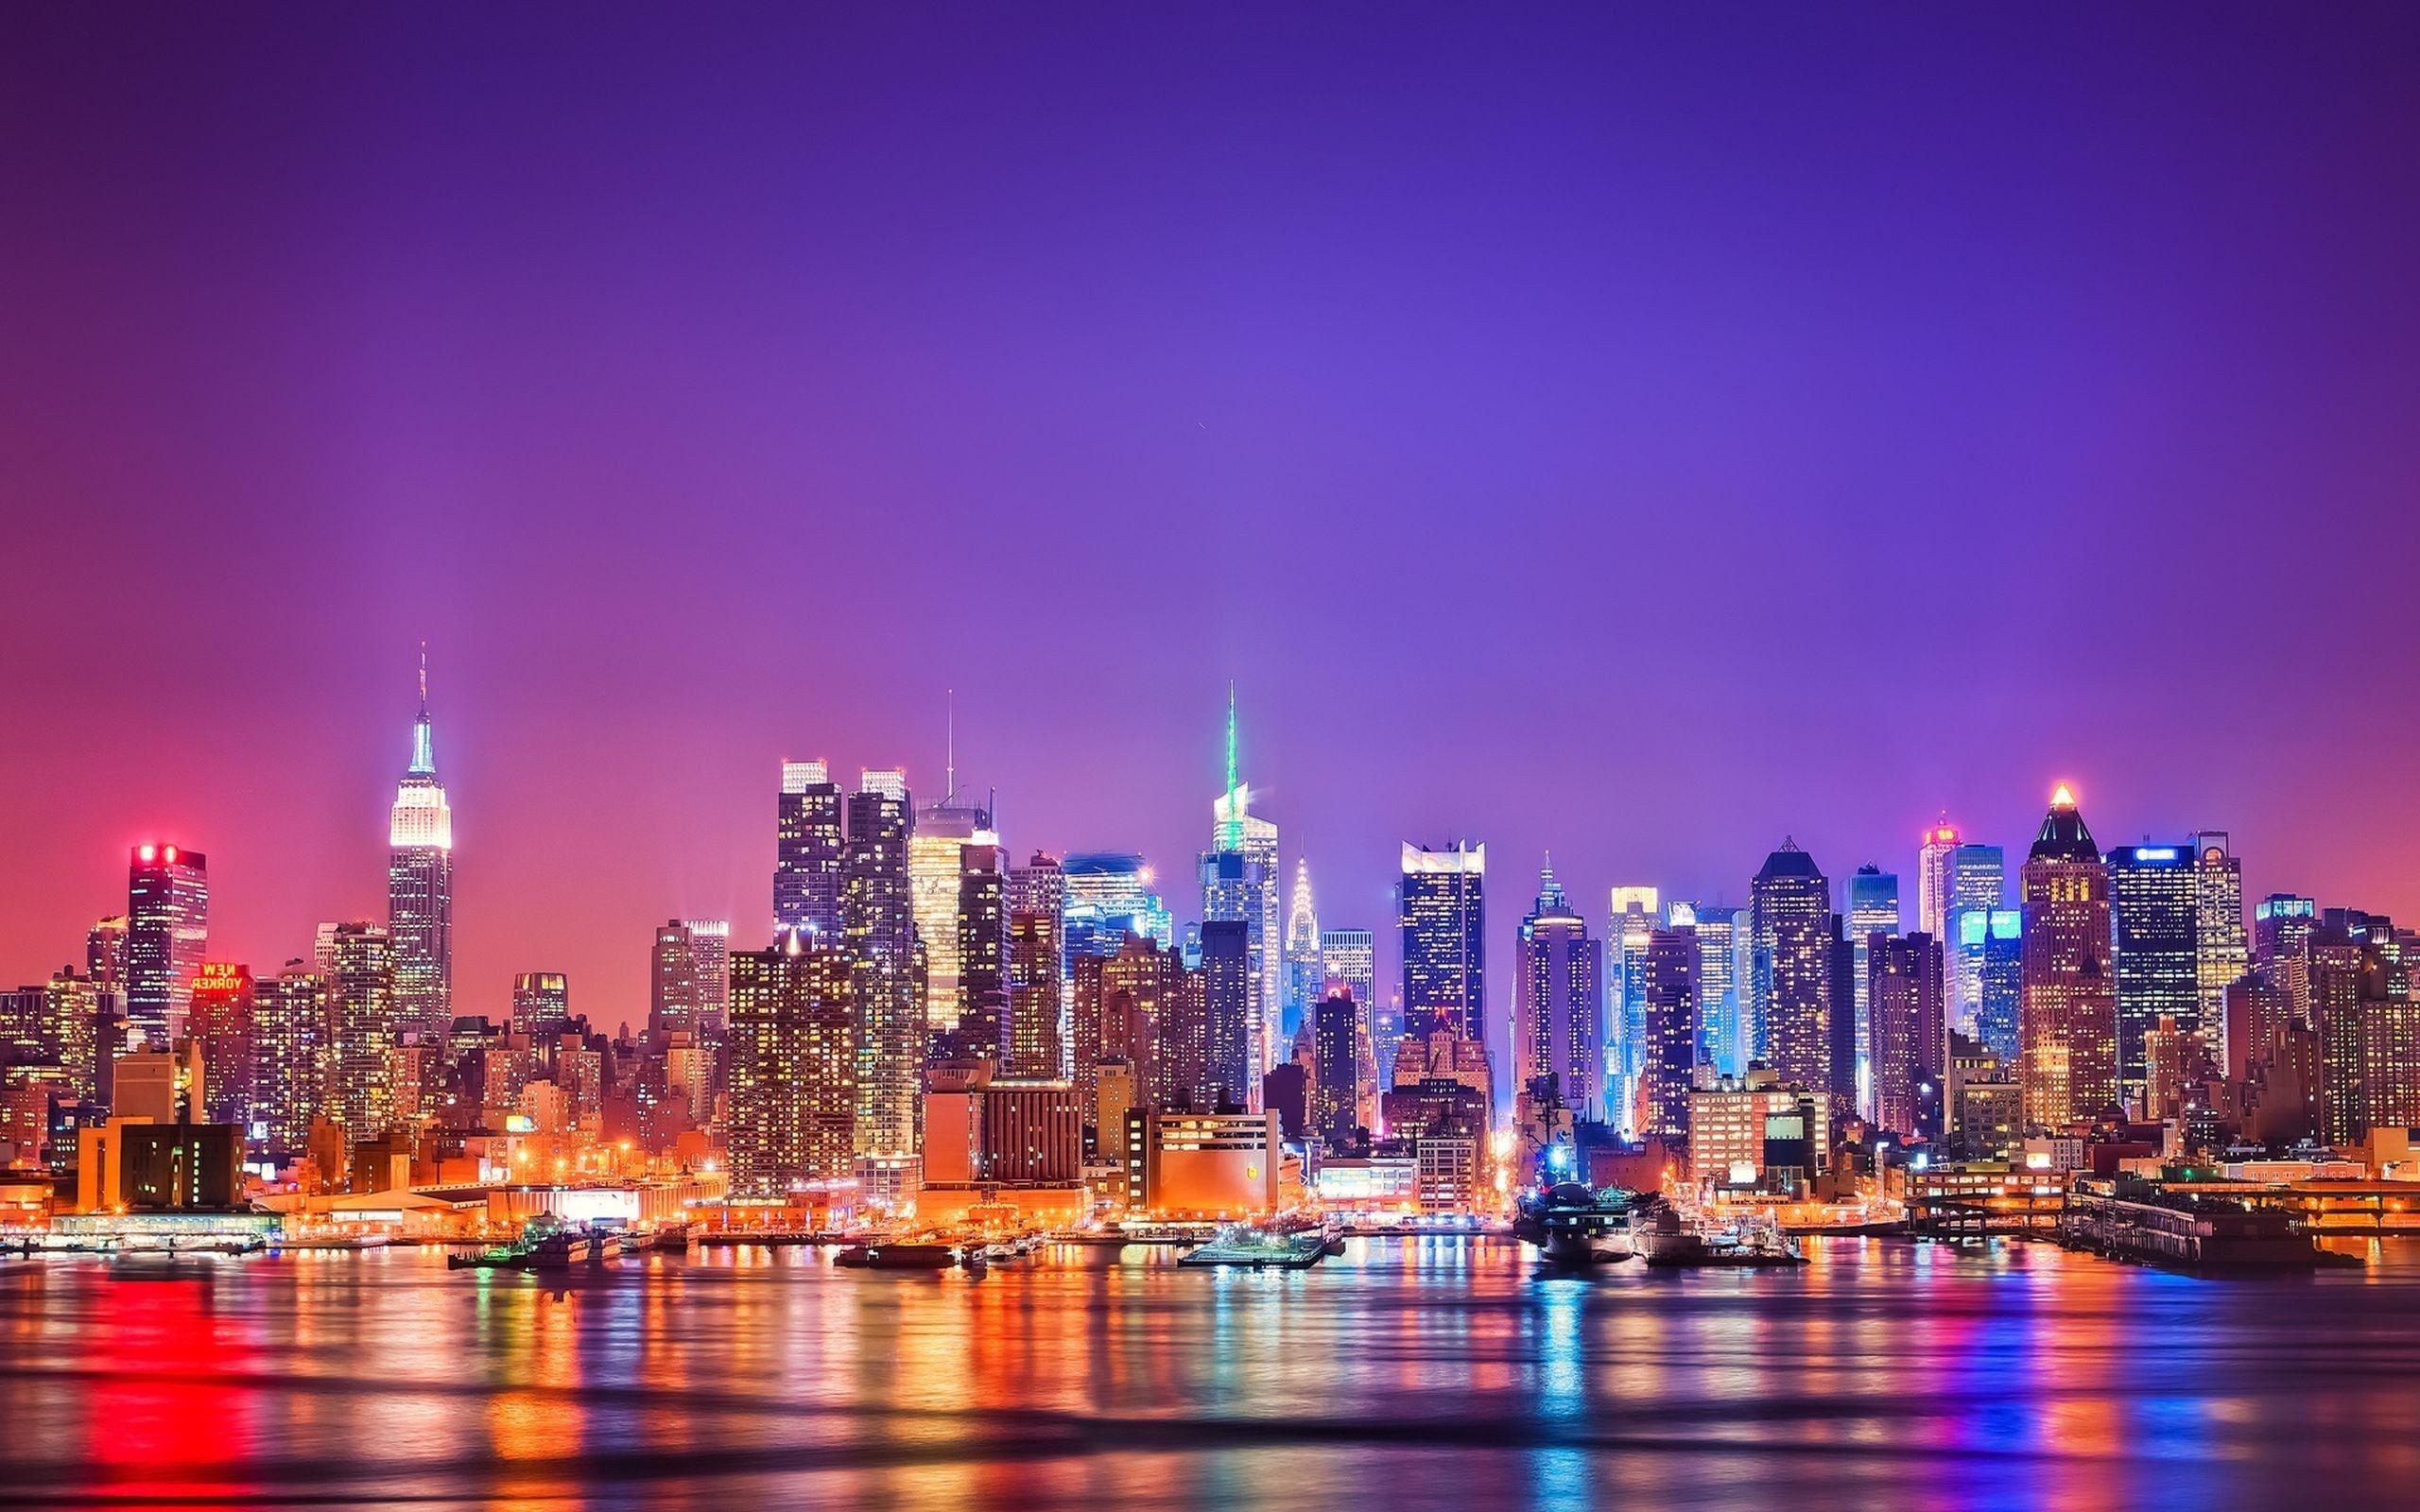 New York City Skyline Hd Wallpaper Ololoshenka New York City